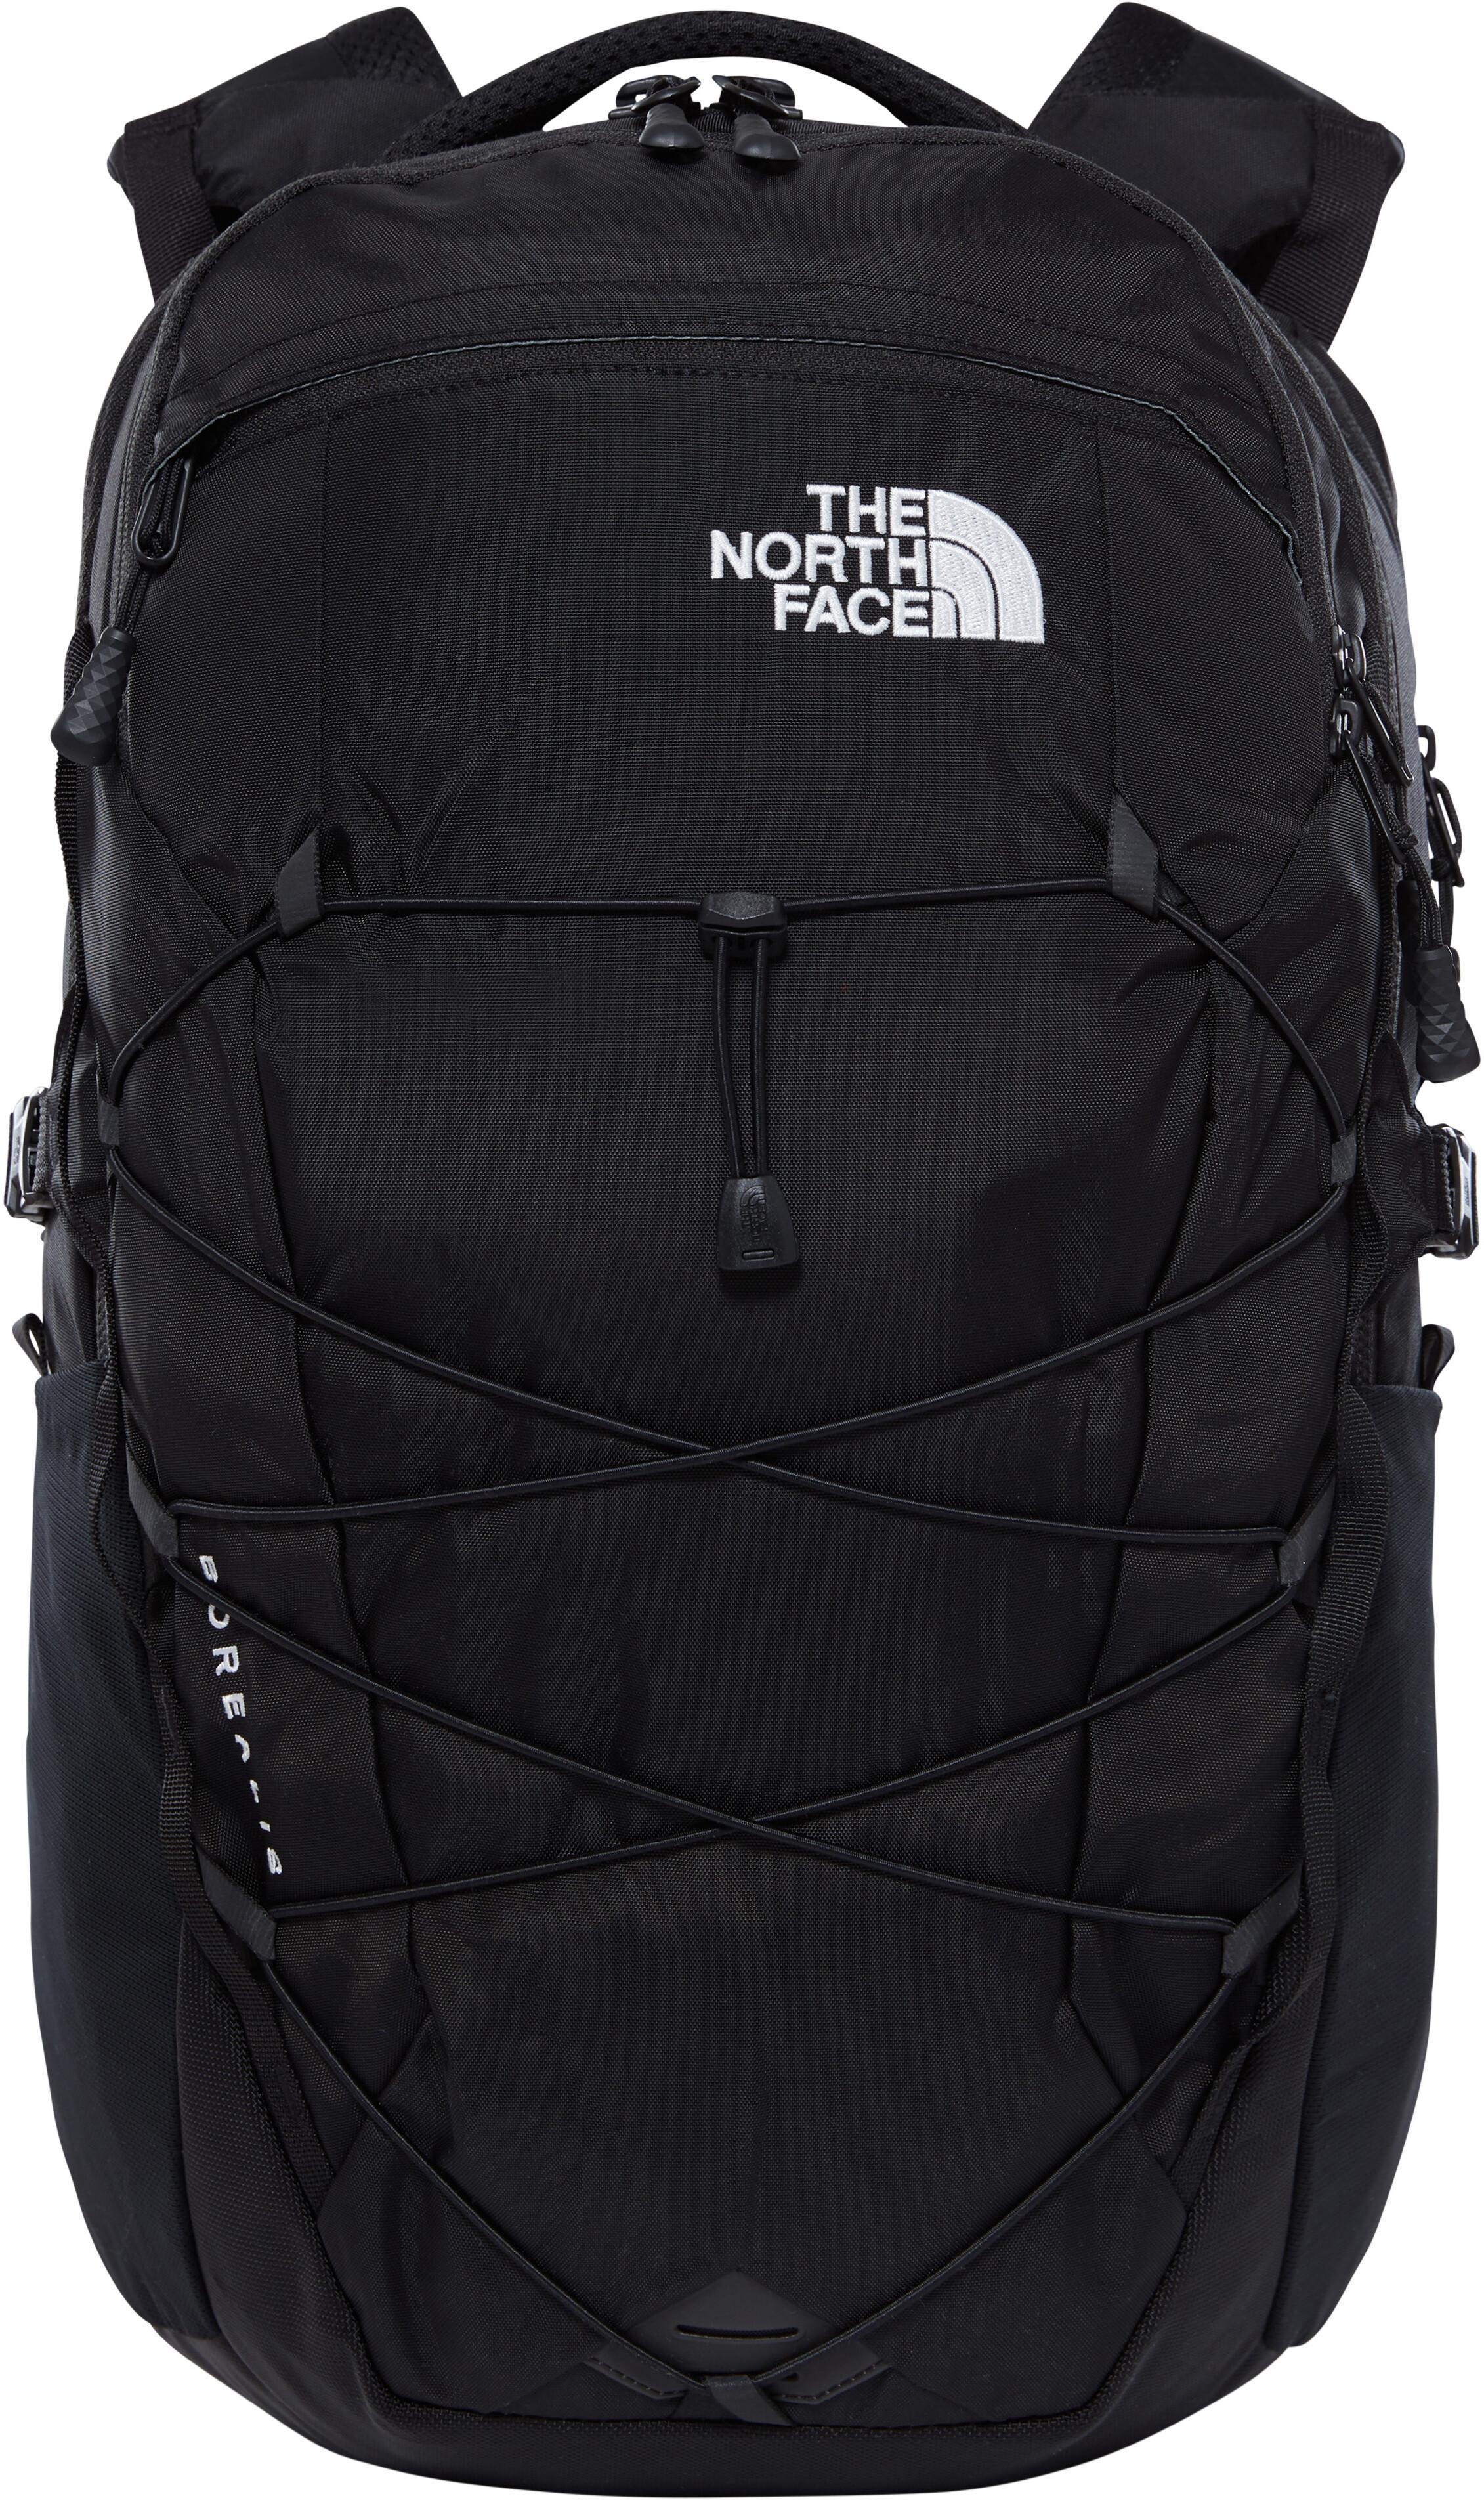 meilleures baskets 11953 58d6a The North Face Borealis Sac à dos, tnf black